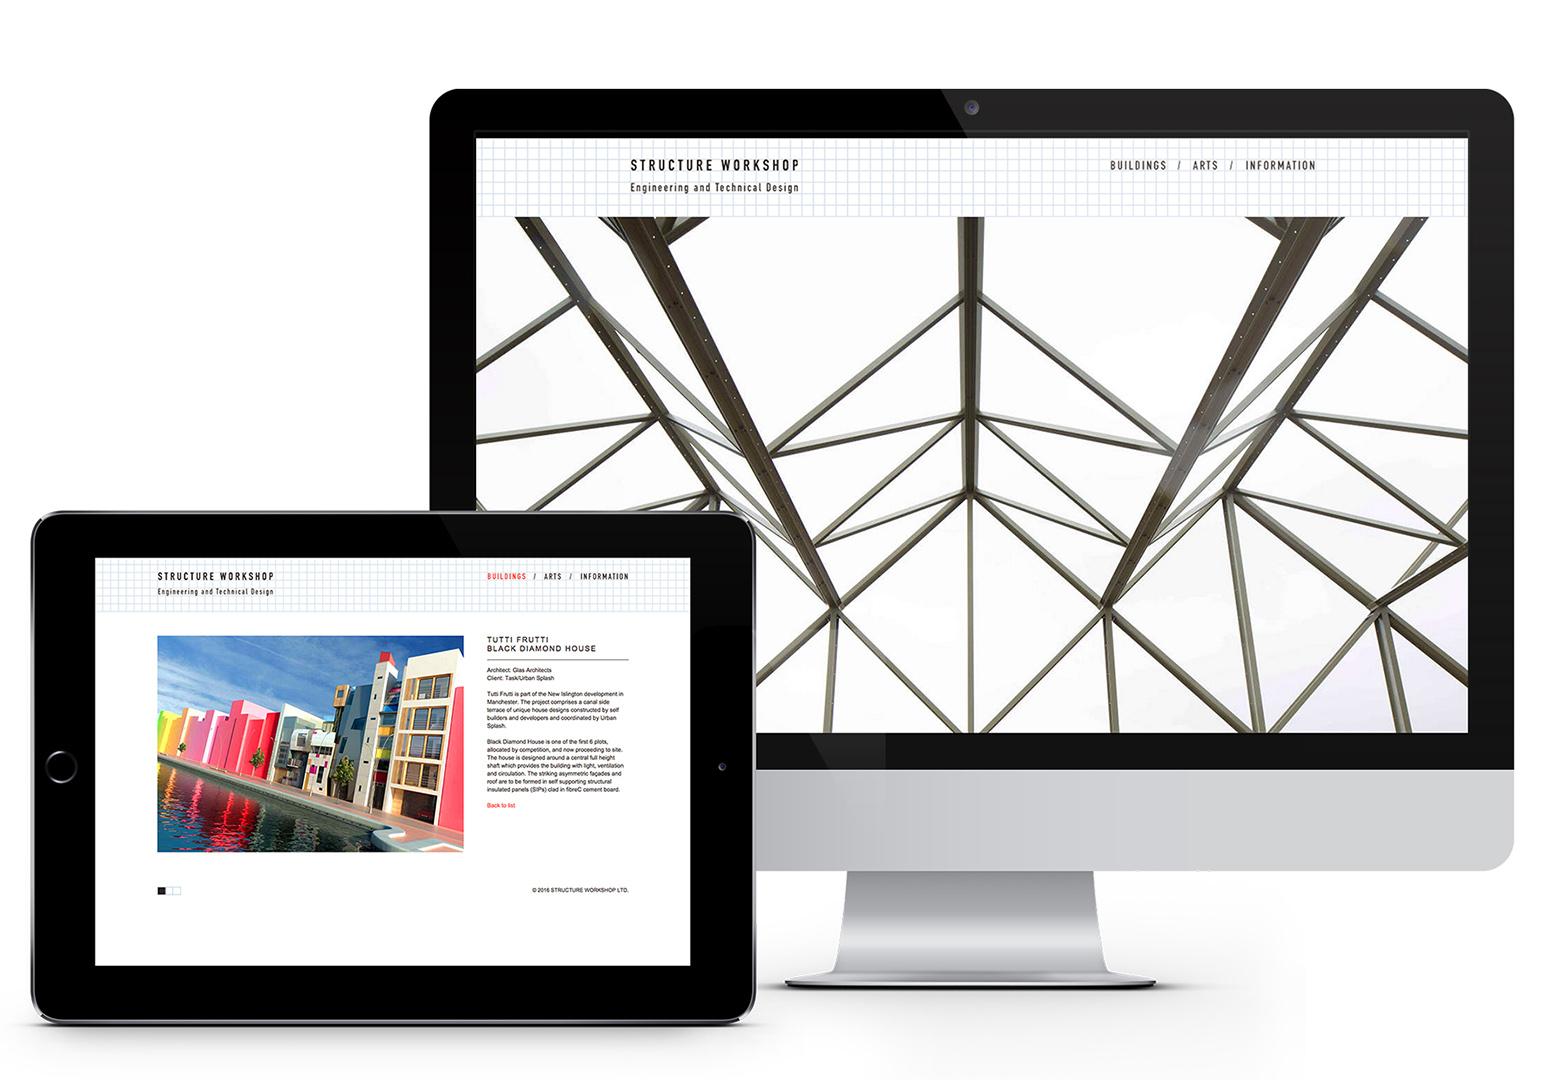 structureWorkshop-Presentation